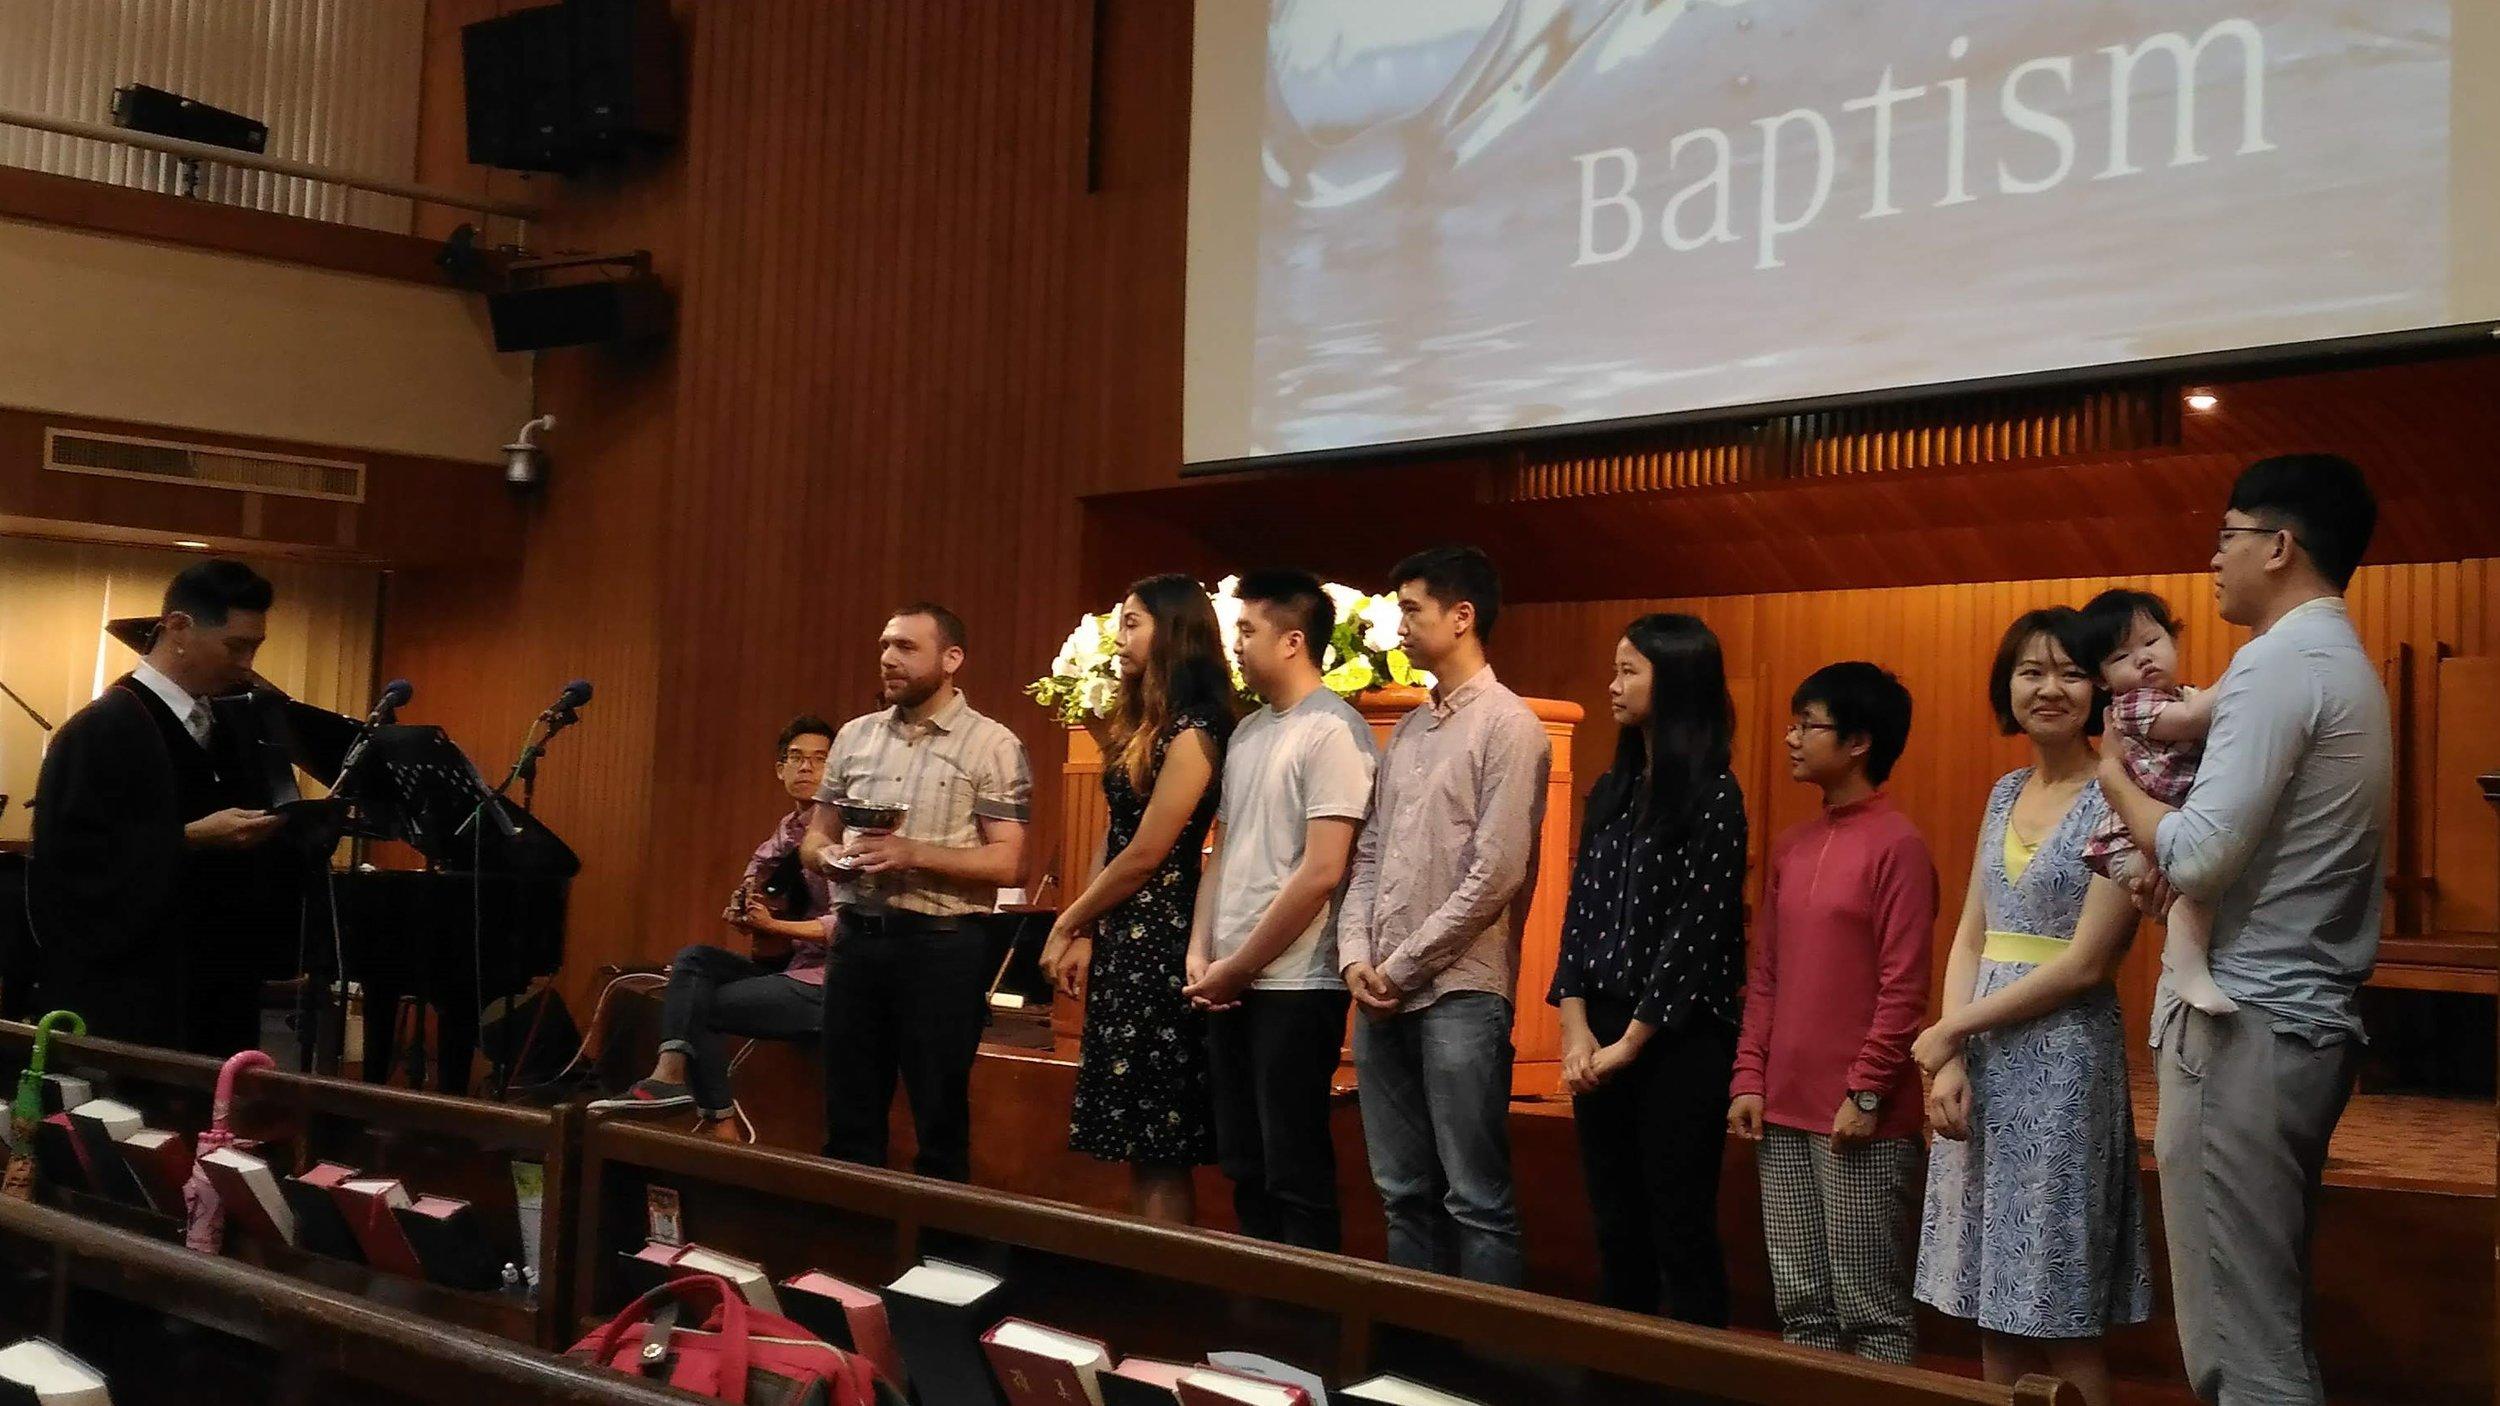 Baptisms_Spring2019_c.jpg